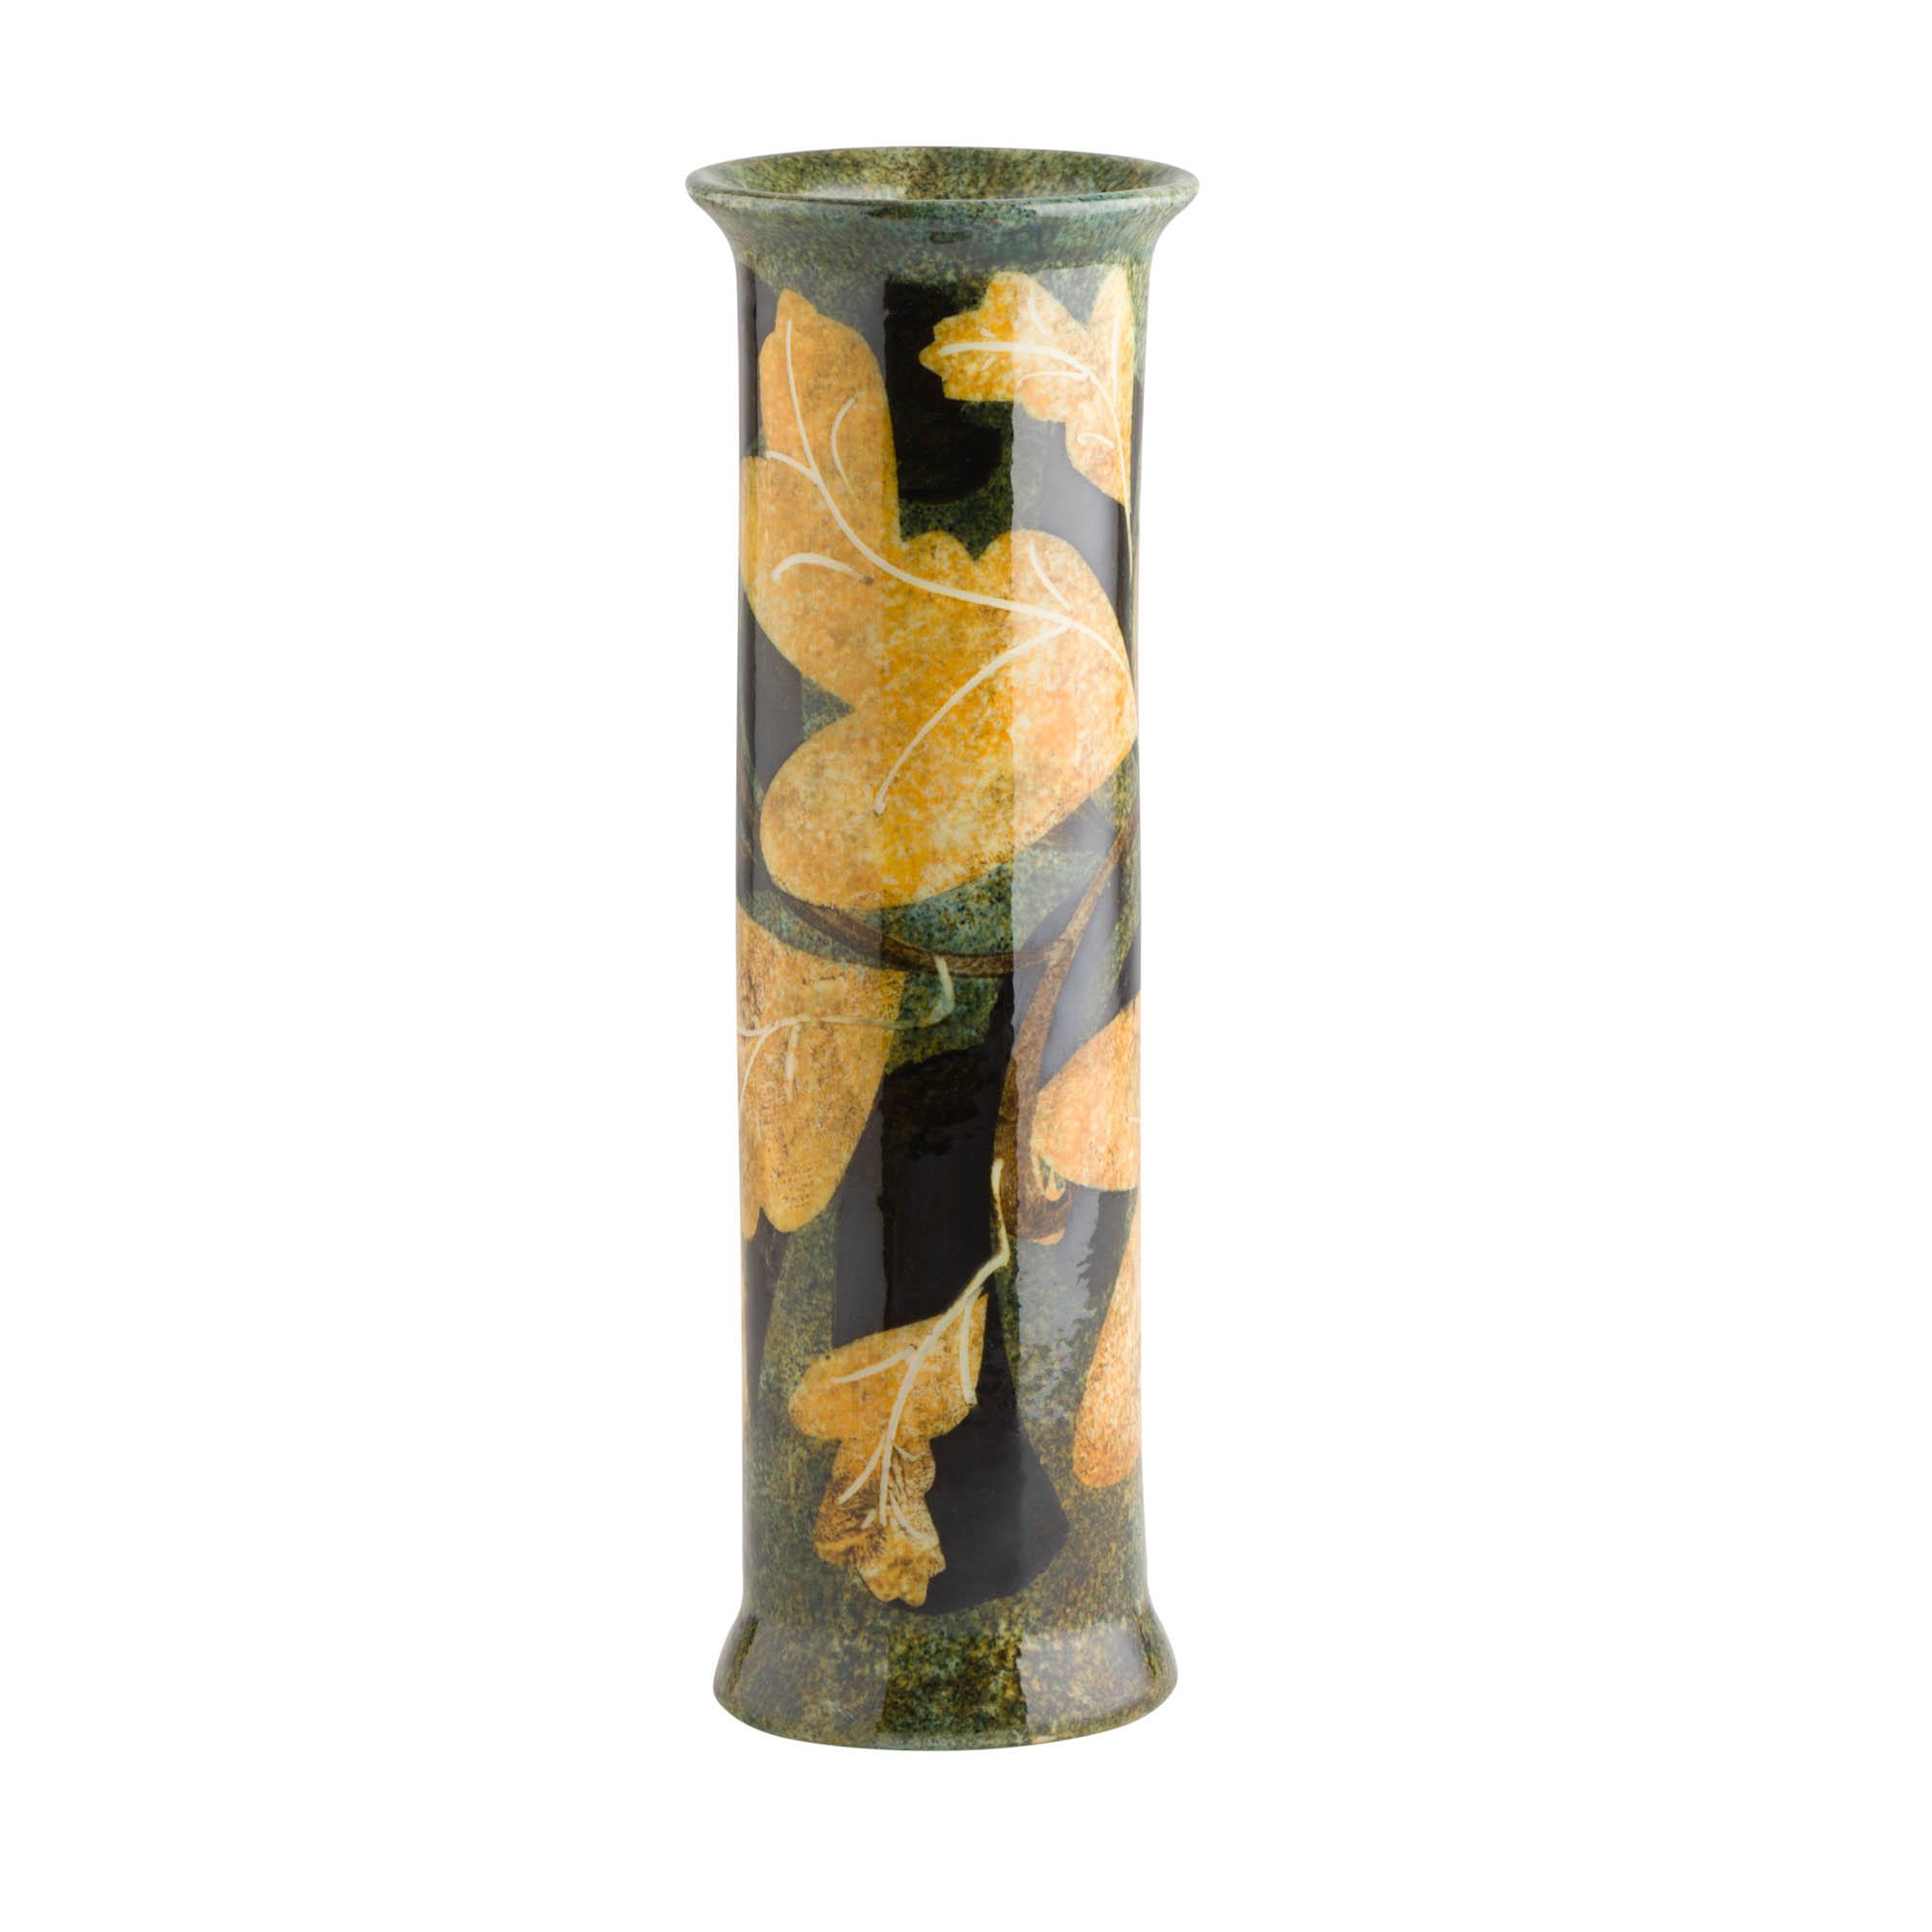 Handmade Cylinder Vases